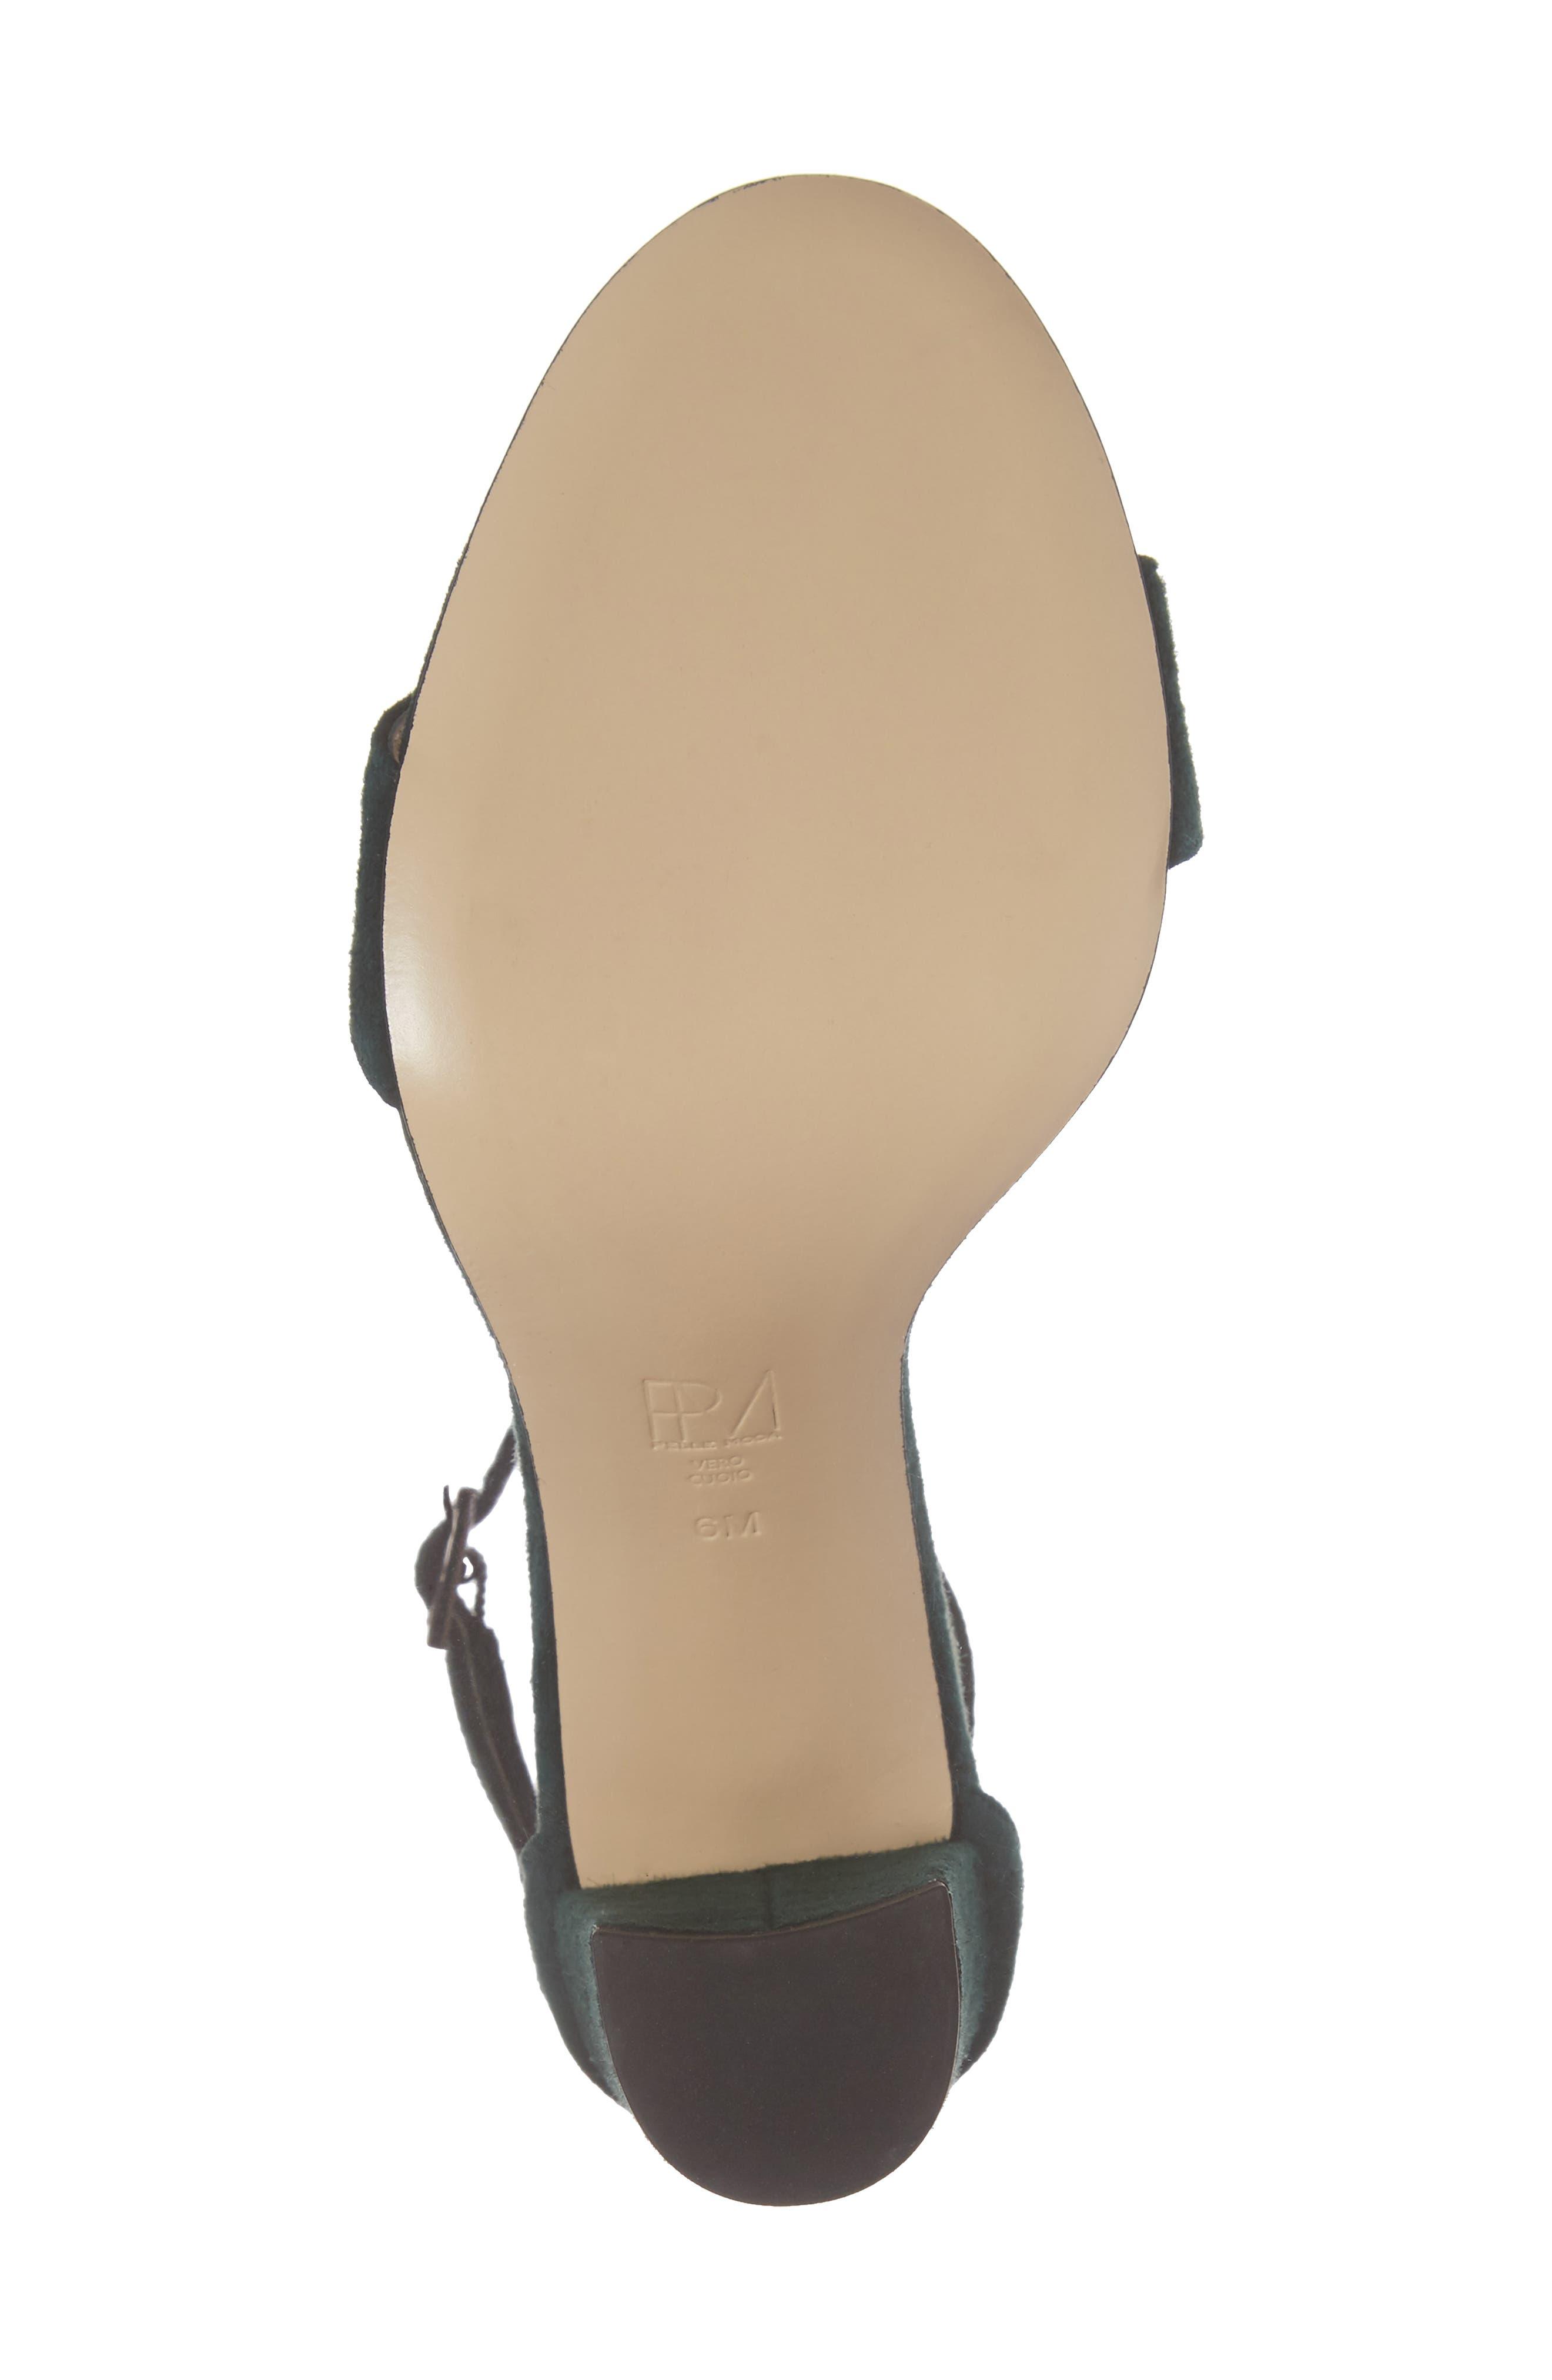 Bonnie Ankle Strap Sandal,                             Alternate thumbnail 6, color,                             Forest Leather